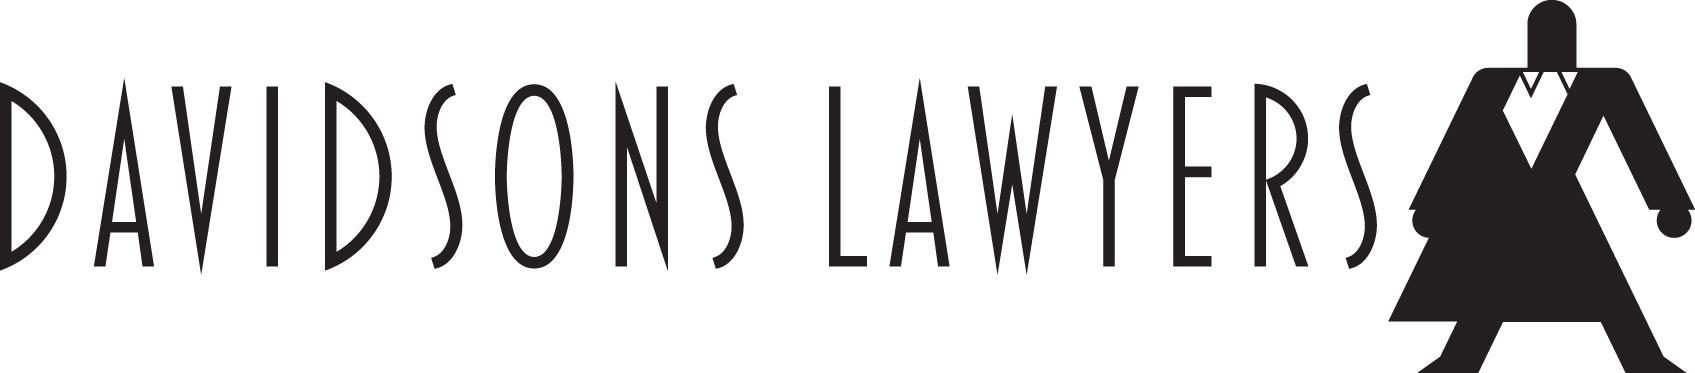 Davidsons Lawyers Logo Text with Figure, NO Pen, BLACK.jpg